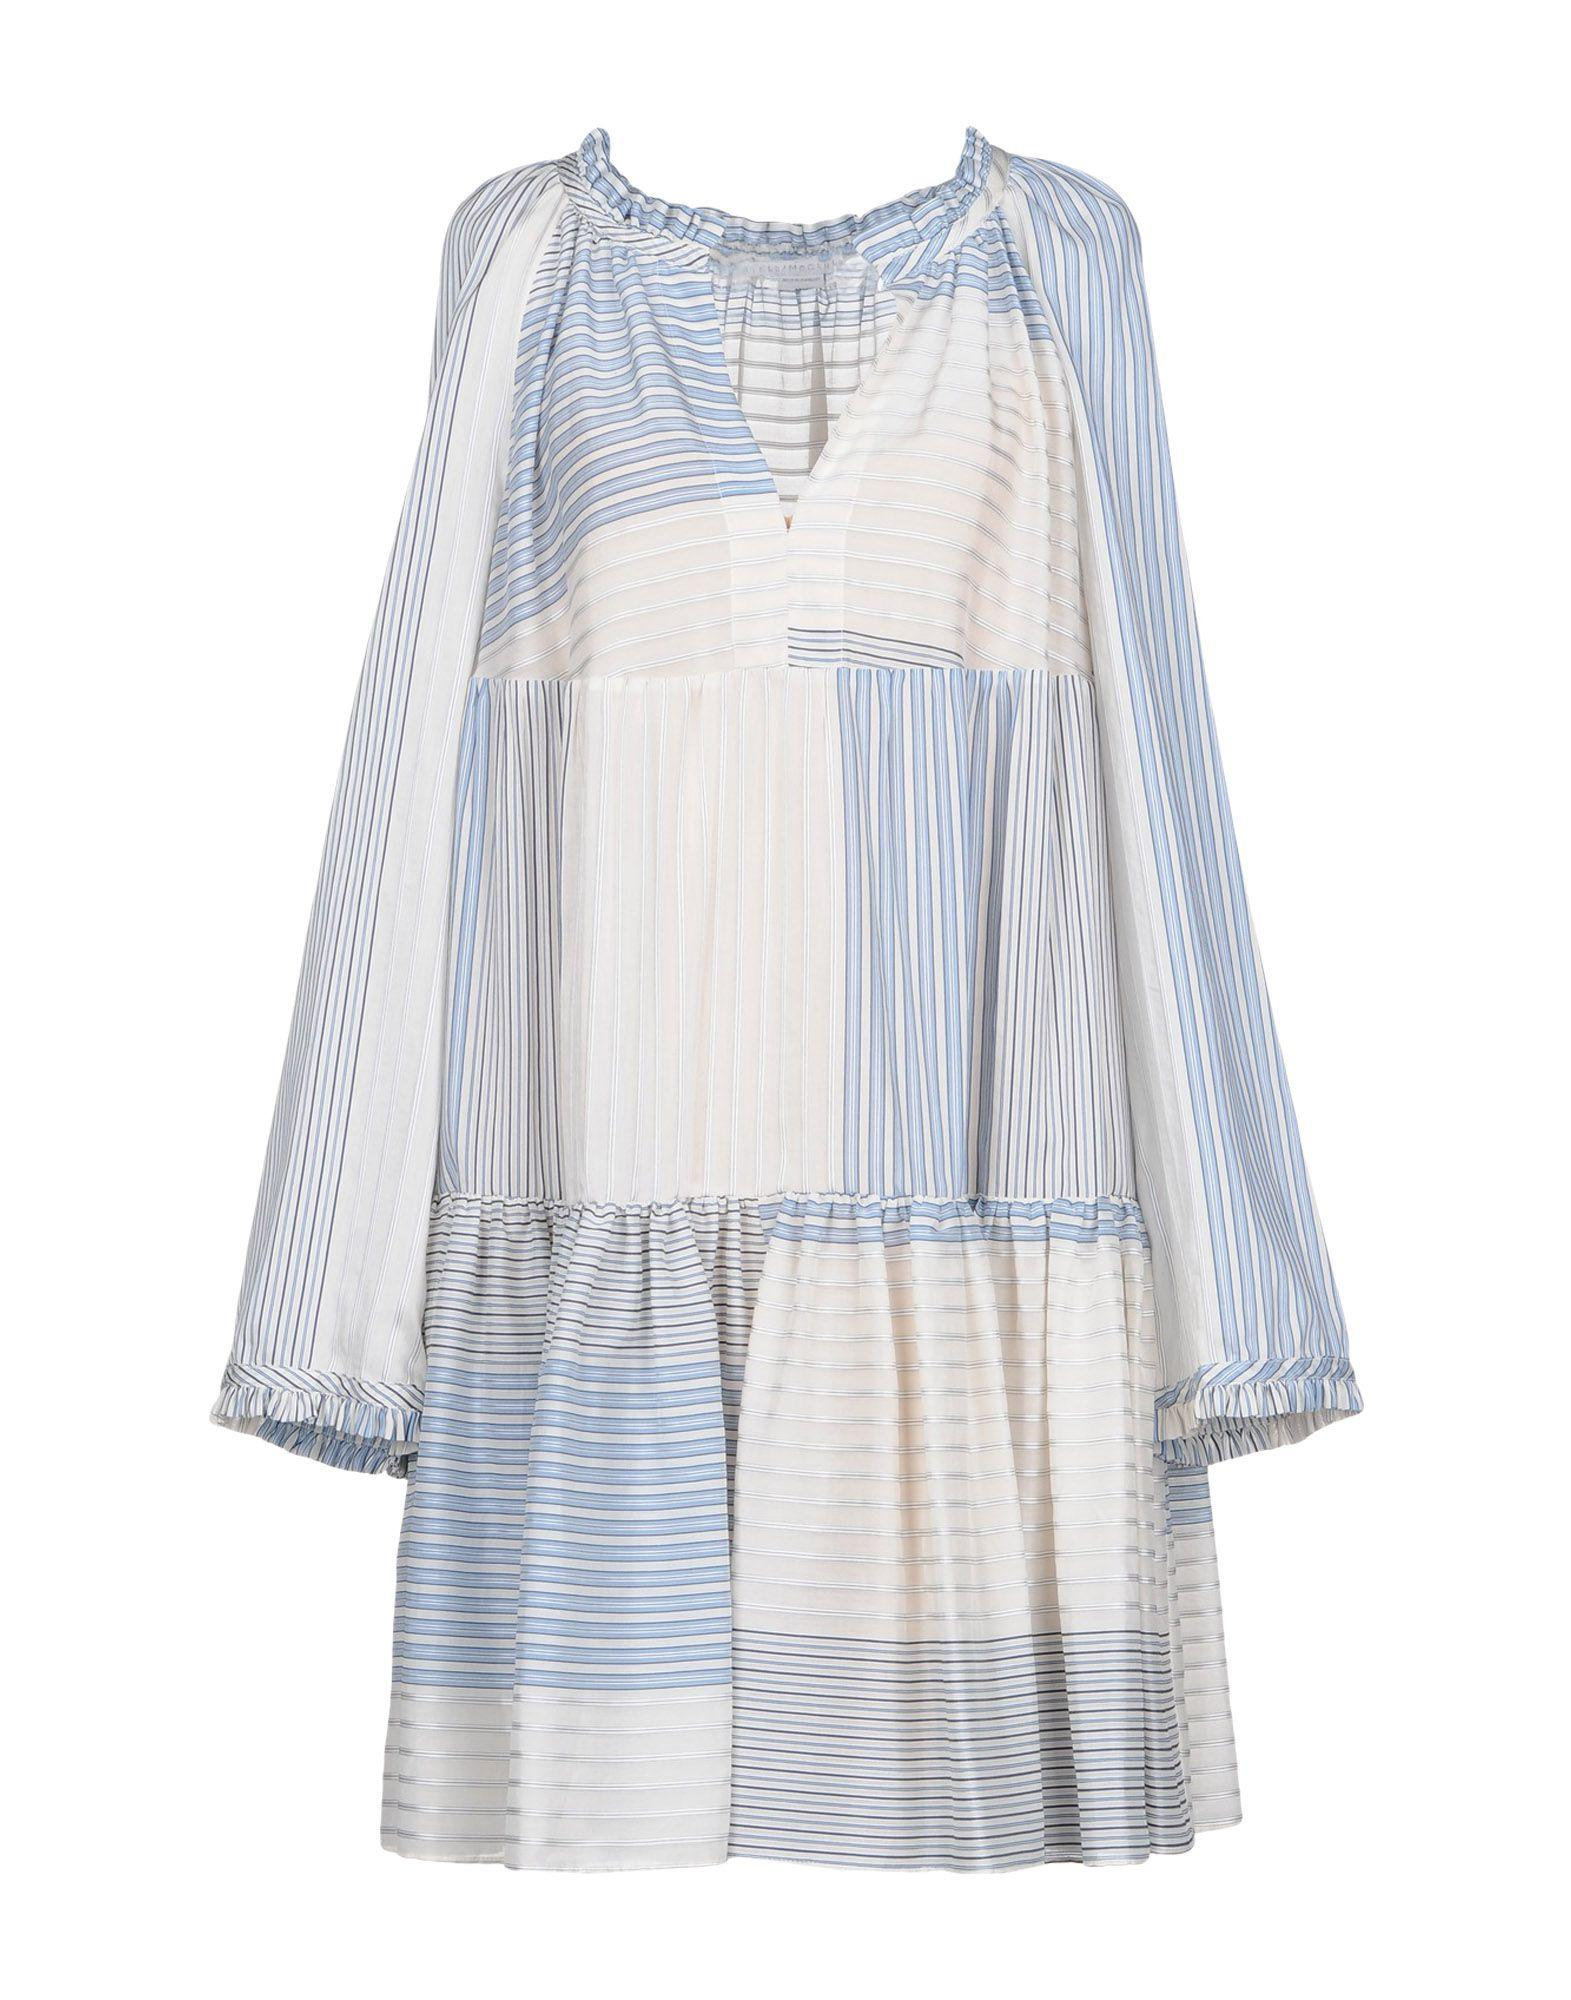 Stella Mccartney Short Dress In Ivory